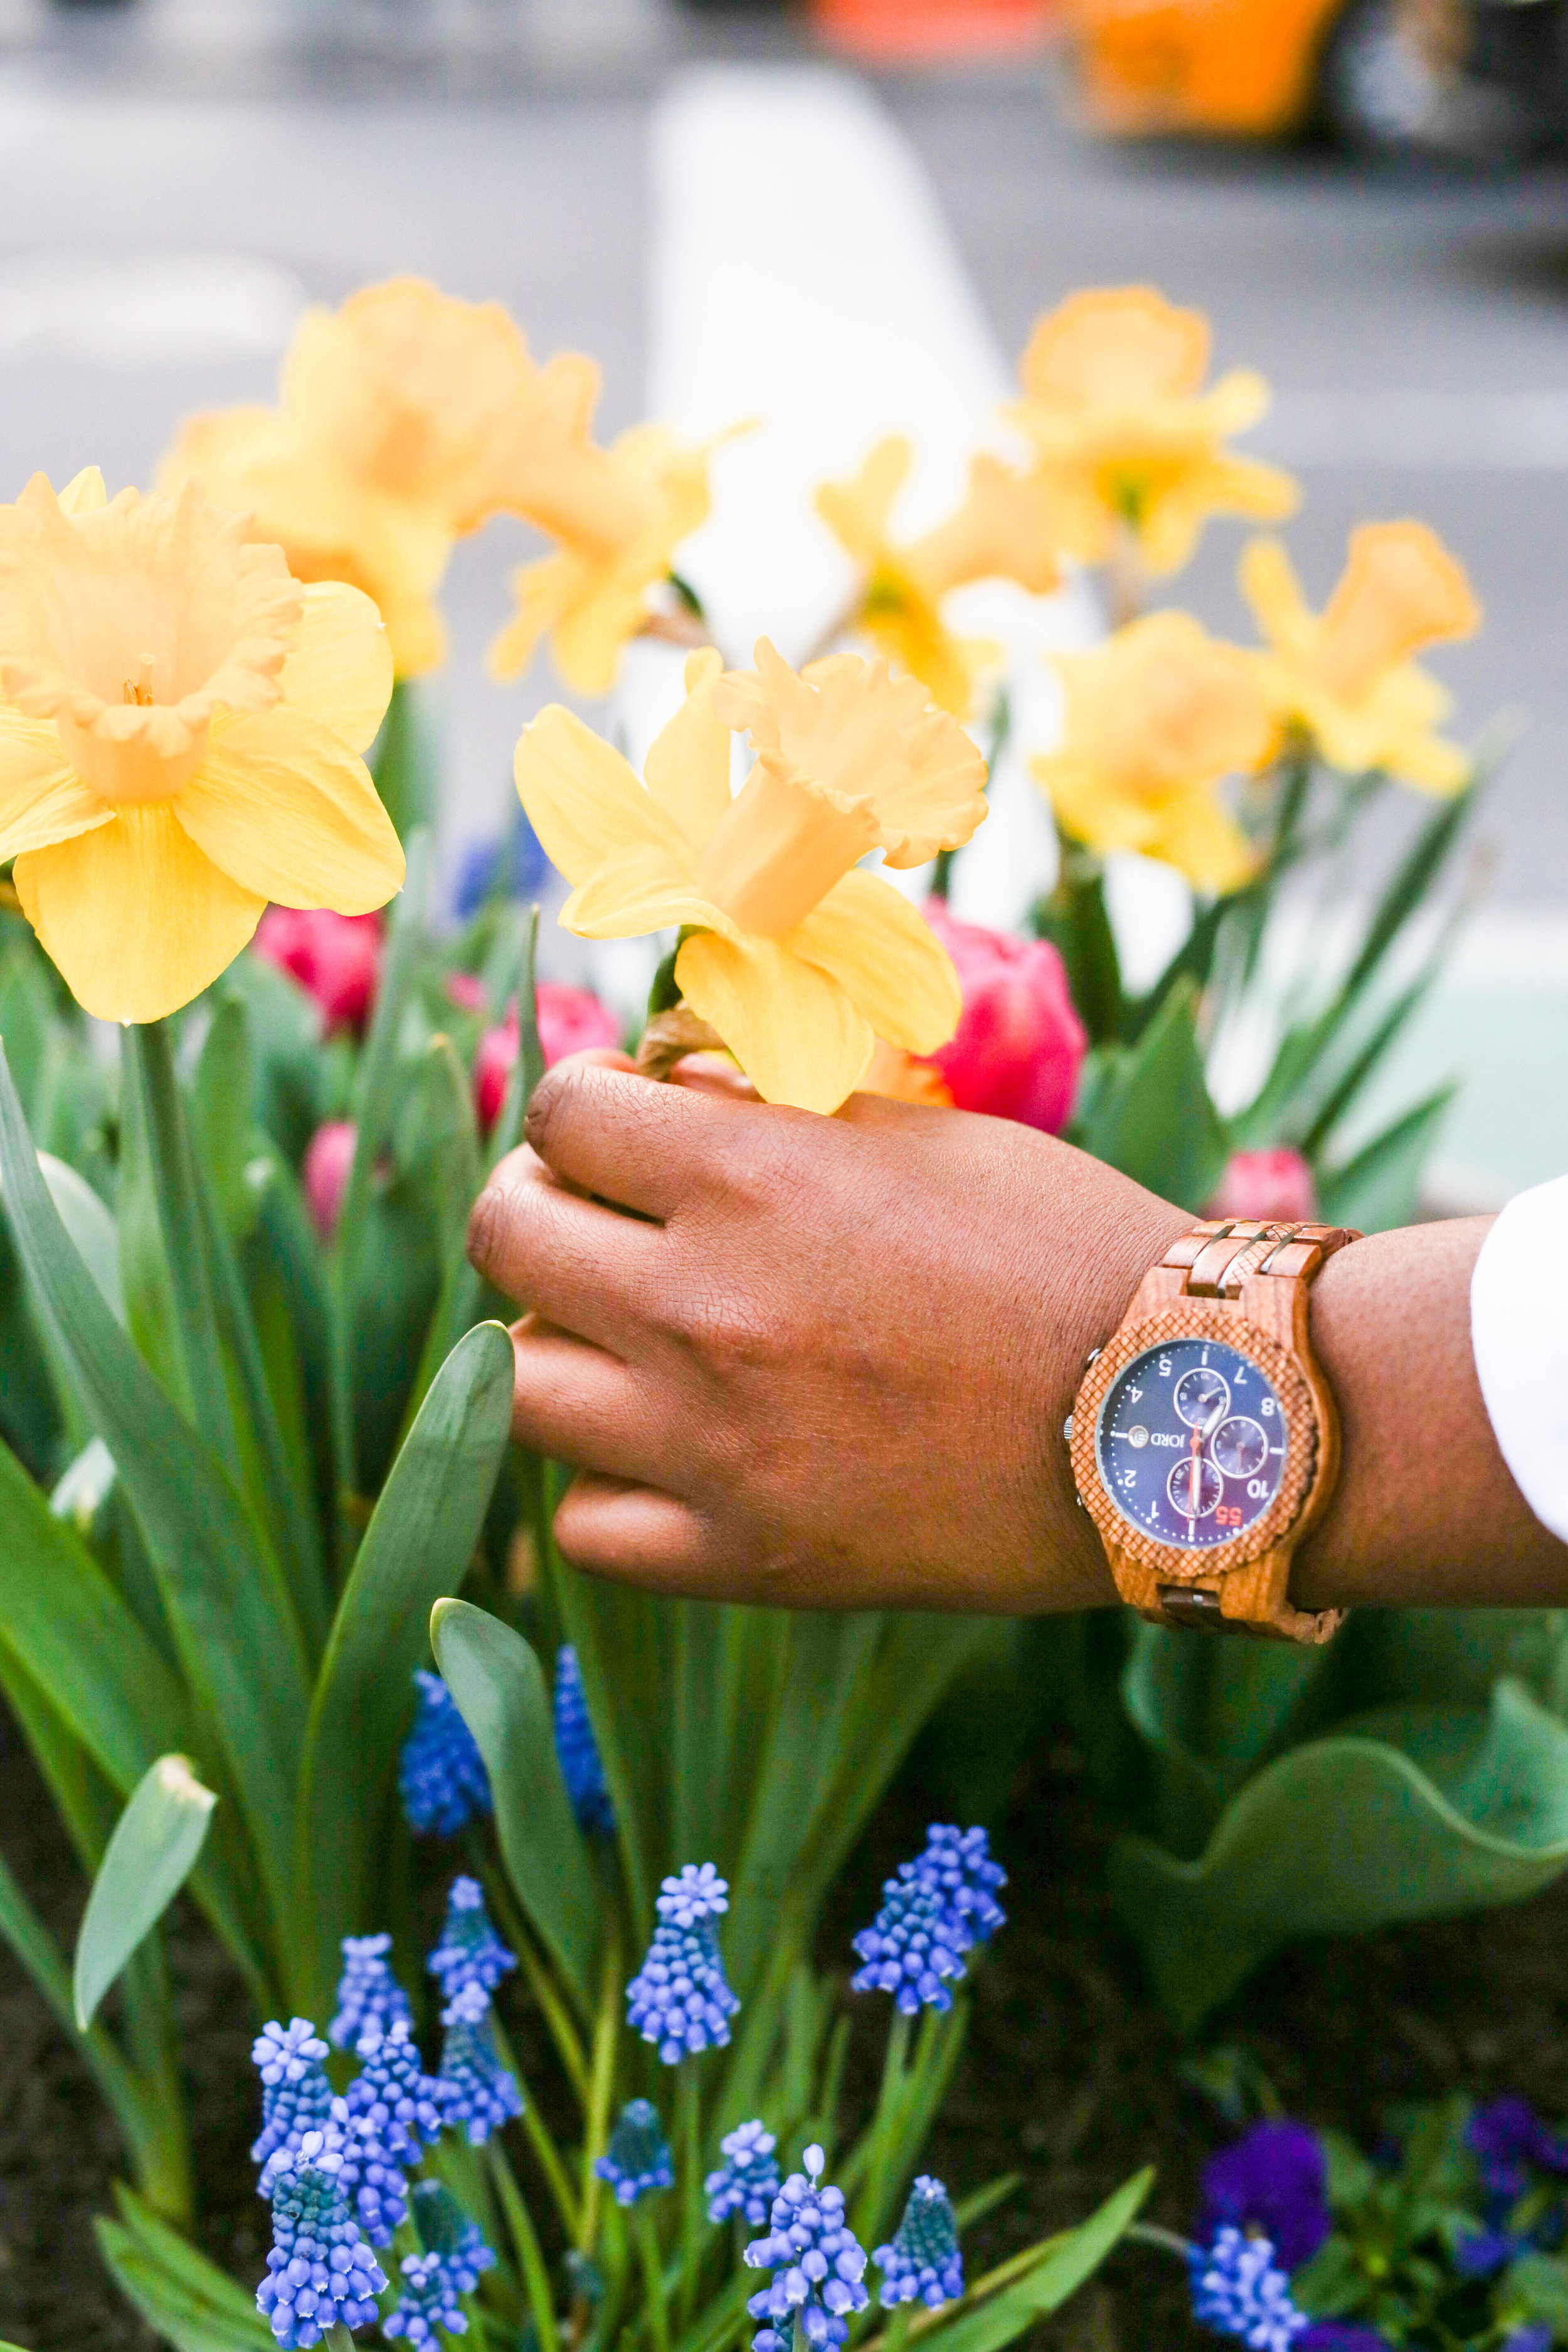 oo lah lah! ;) I'm loving my Jord Watch!